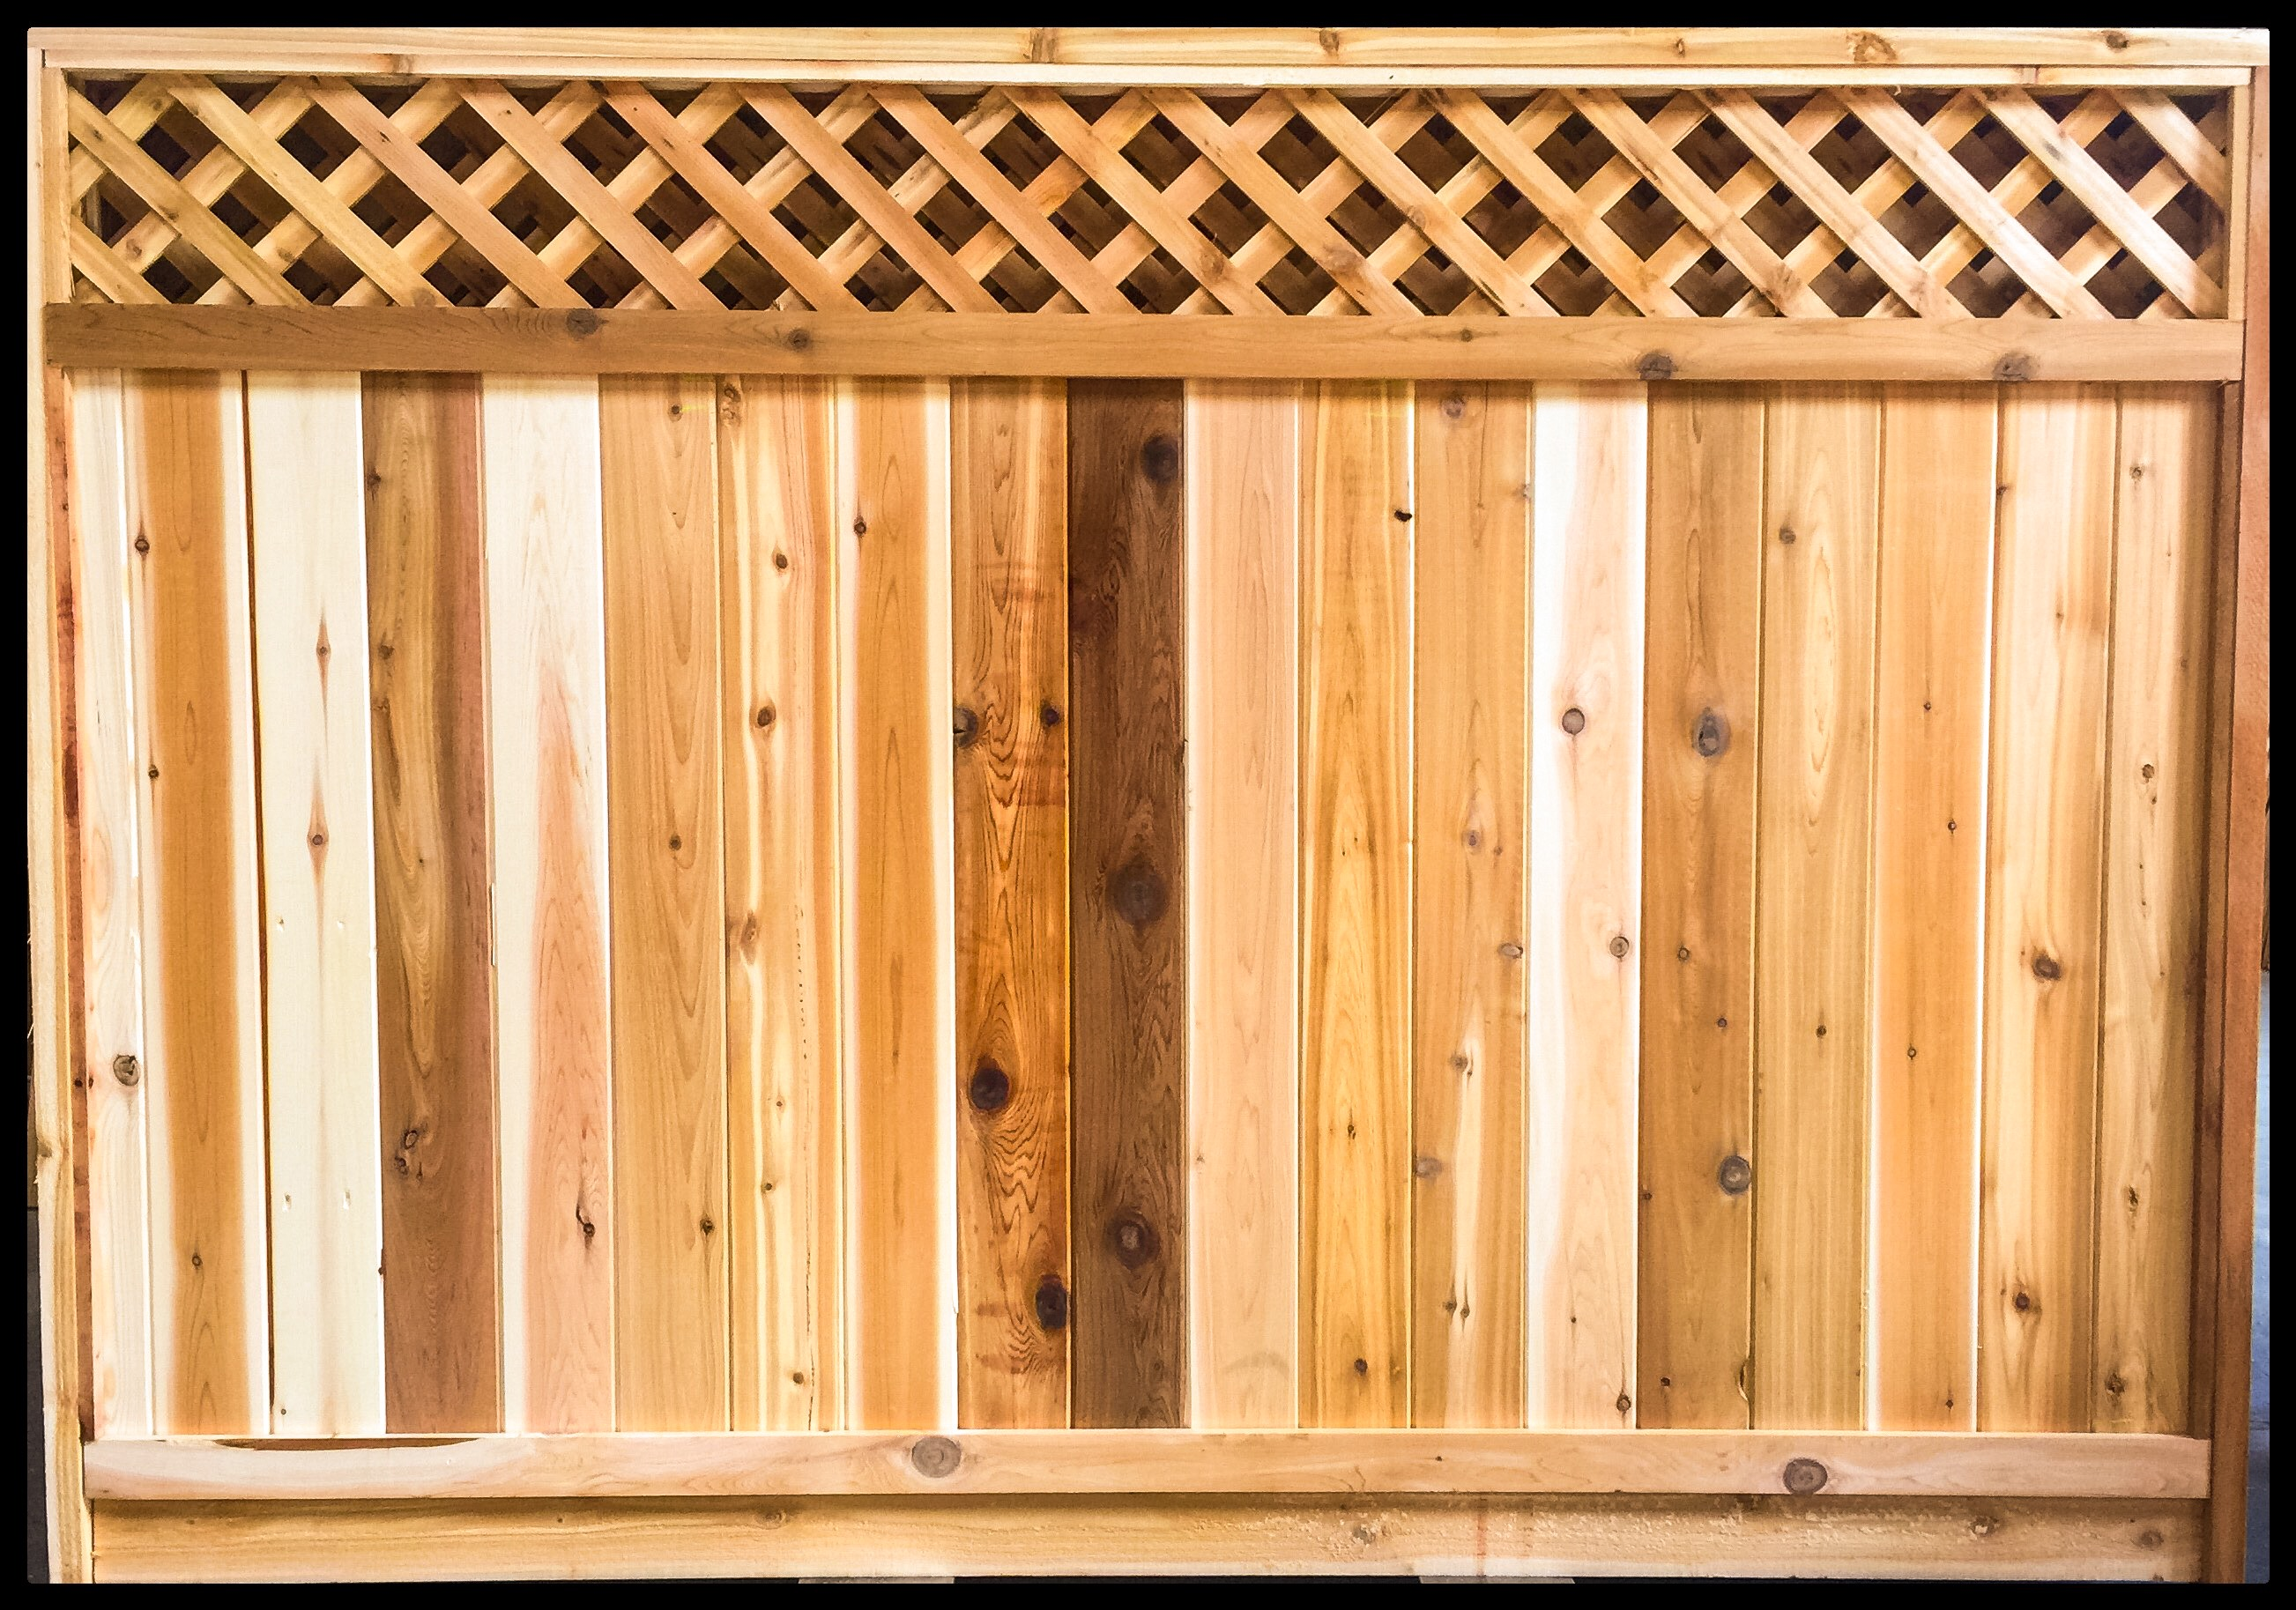 Aim Cedar Works Ltd Quality Fence Panels Decks And